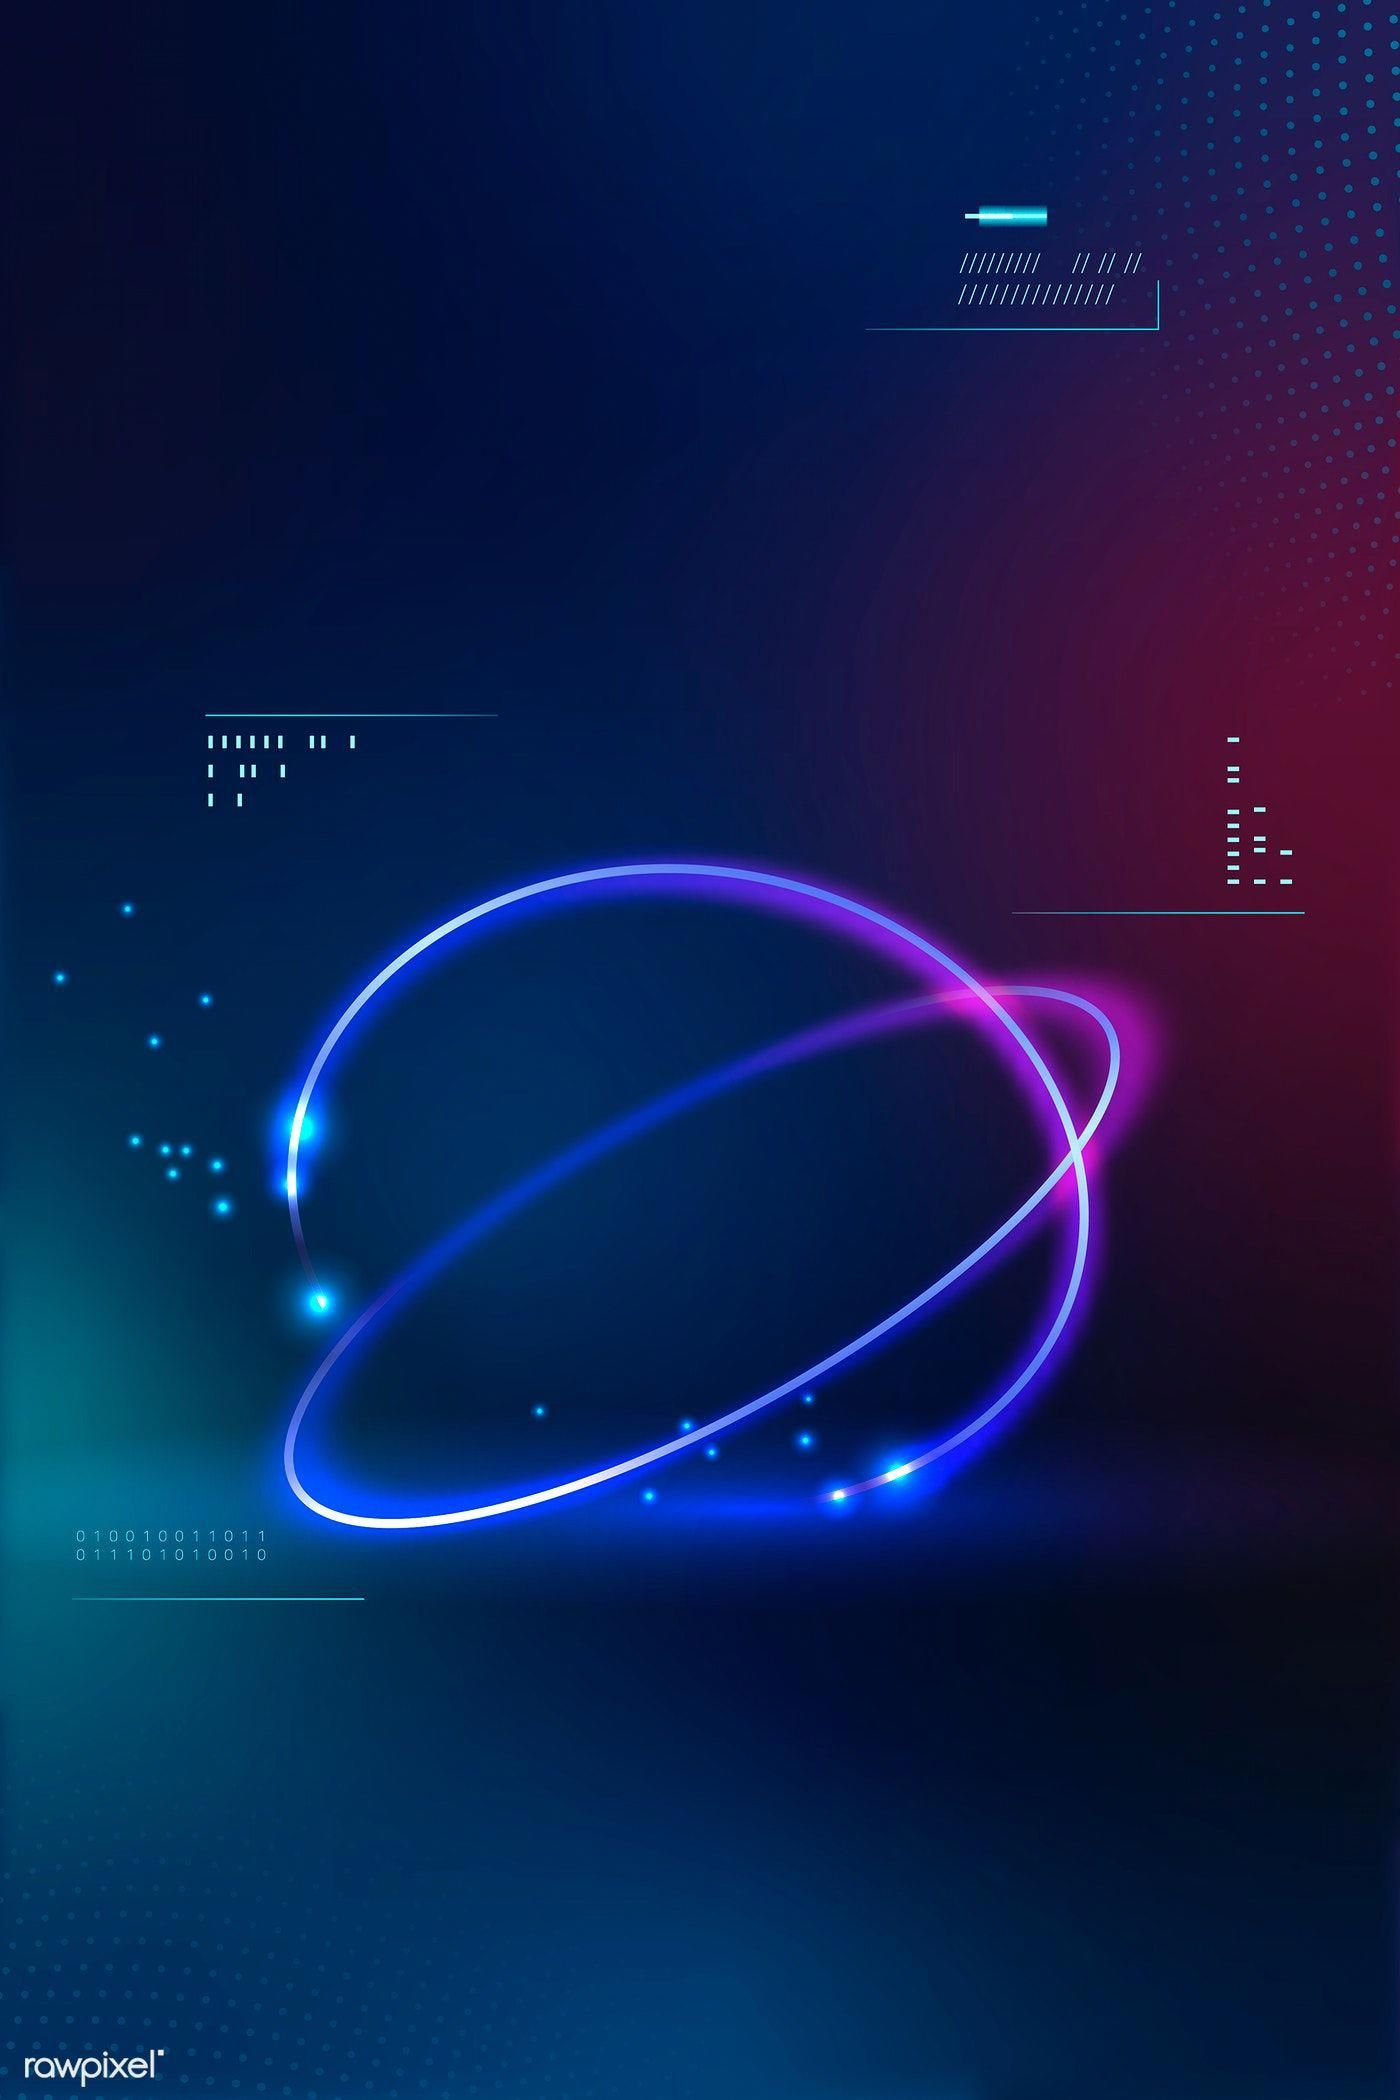 Technology Innovation Futuristictechnology In 2020 Technology Wallpaper Technology Posters Futuristic Technology